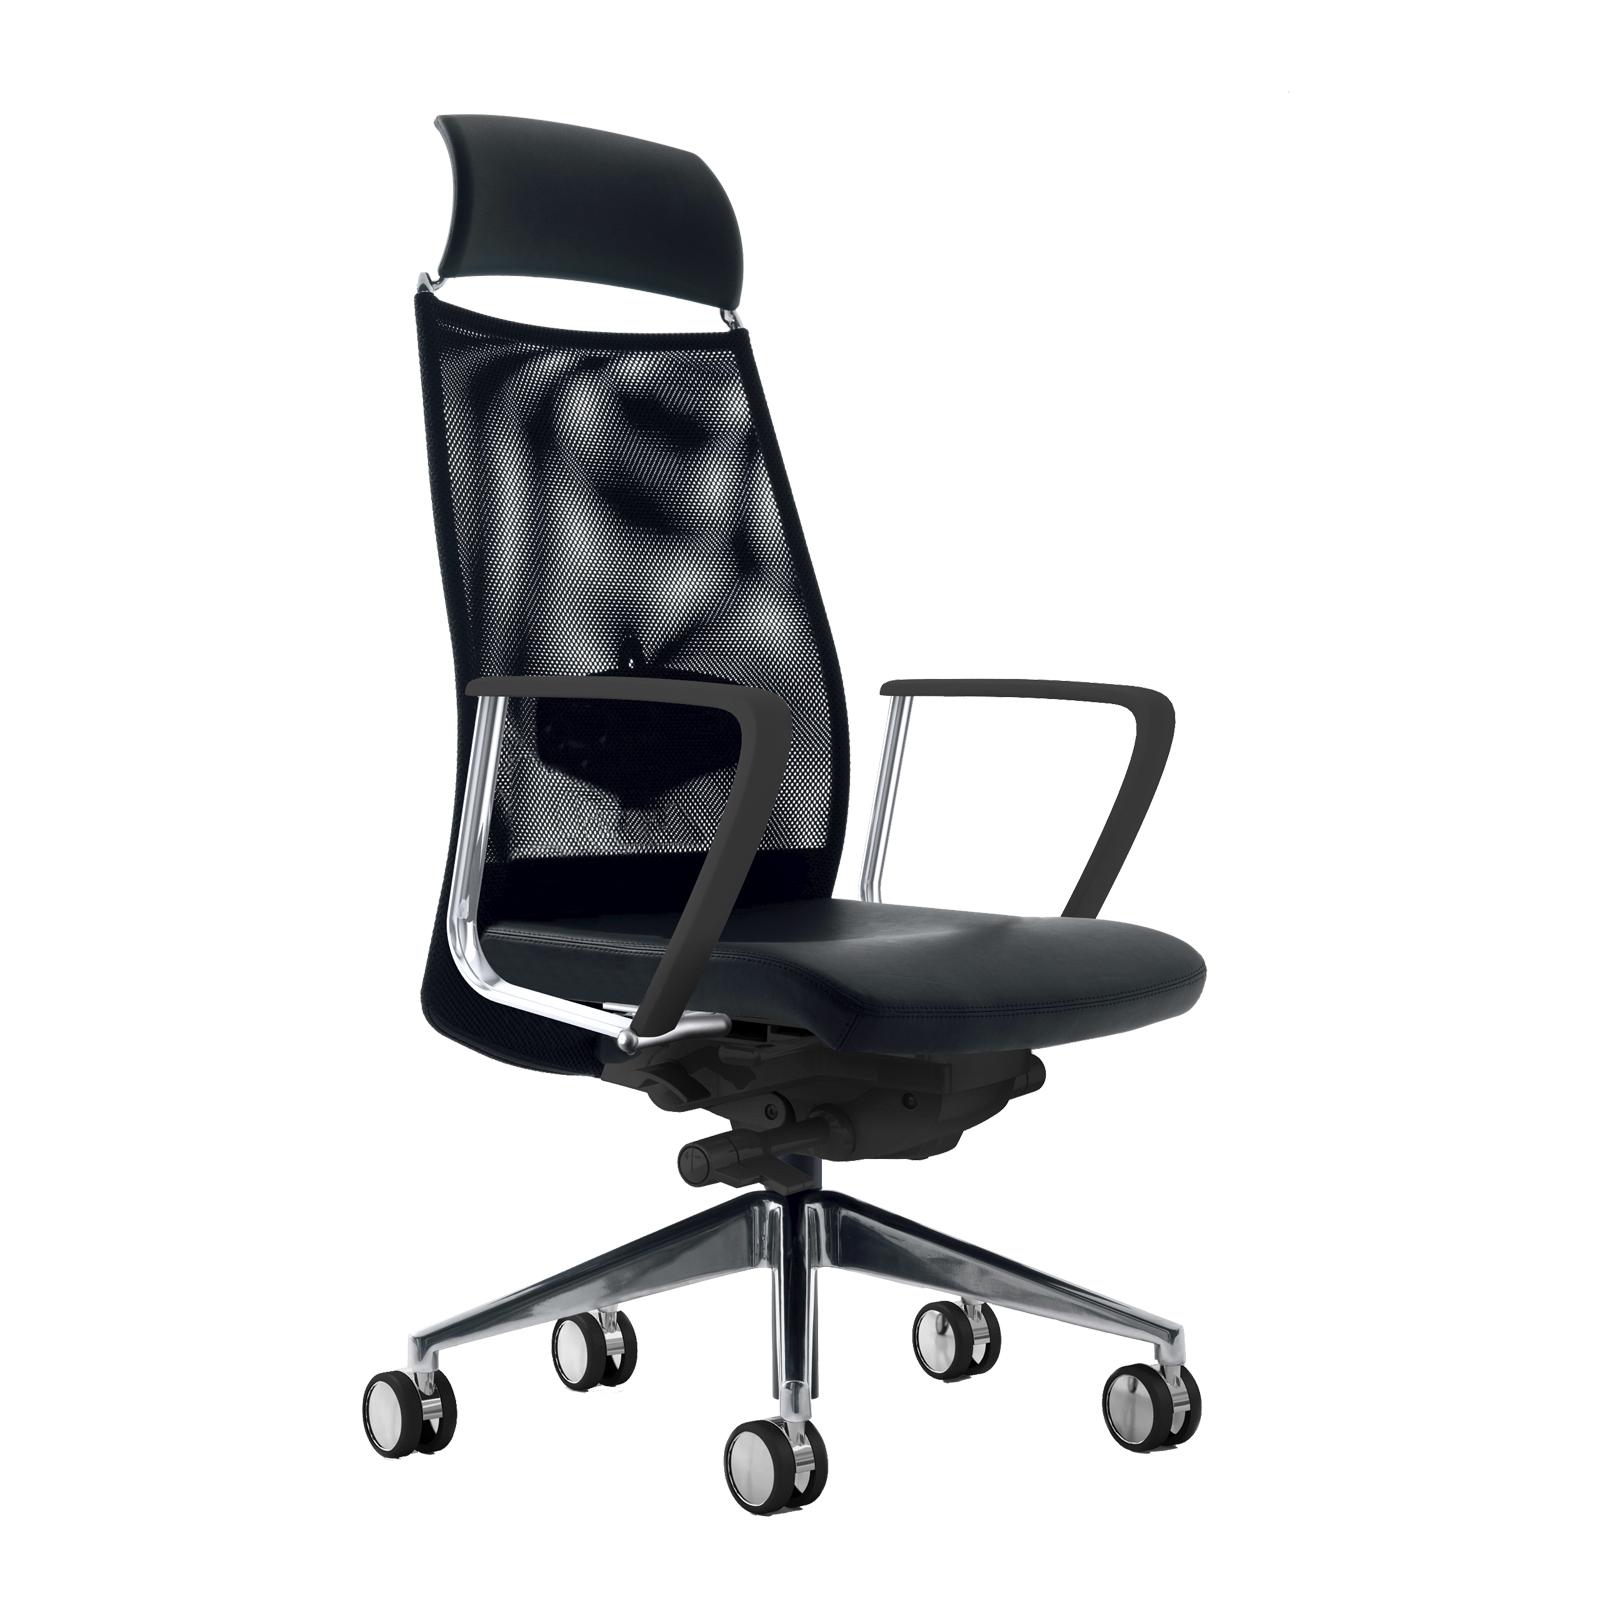 Links Sedia Ufficio Office.Aresline Comfort Experiences Workplaces Products